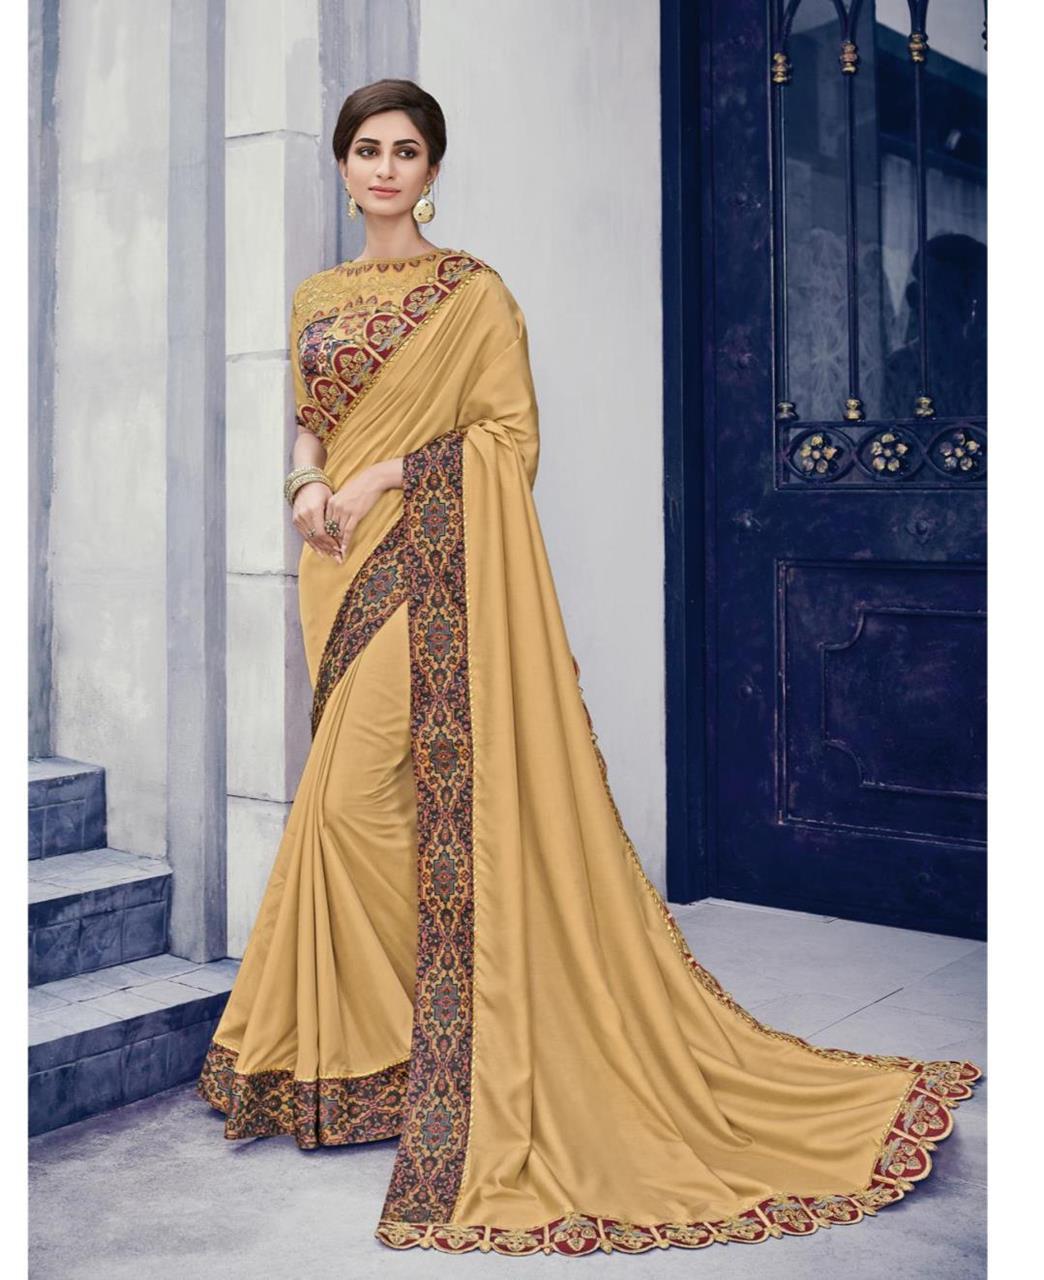 Border Work Silk Saree (Sari) in Gold